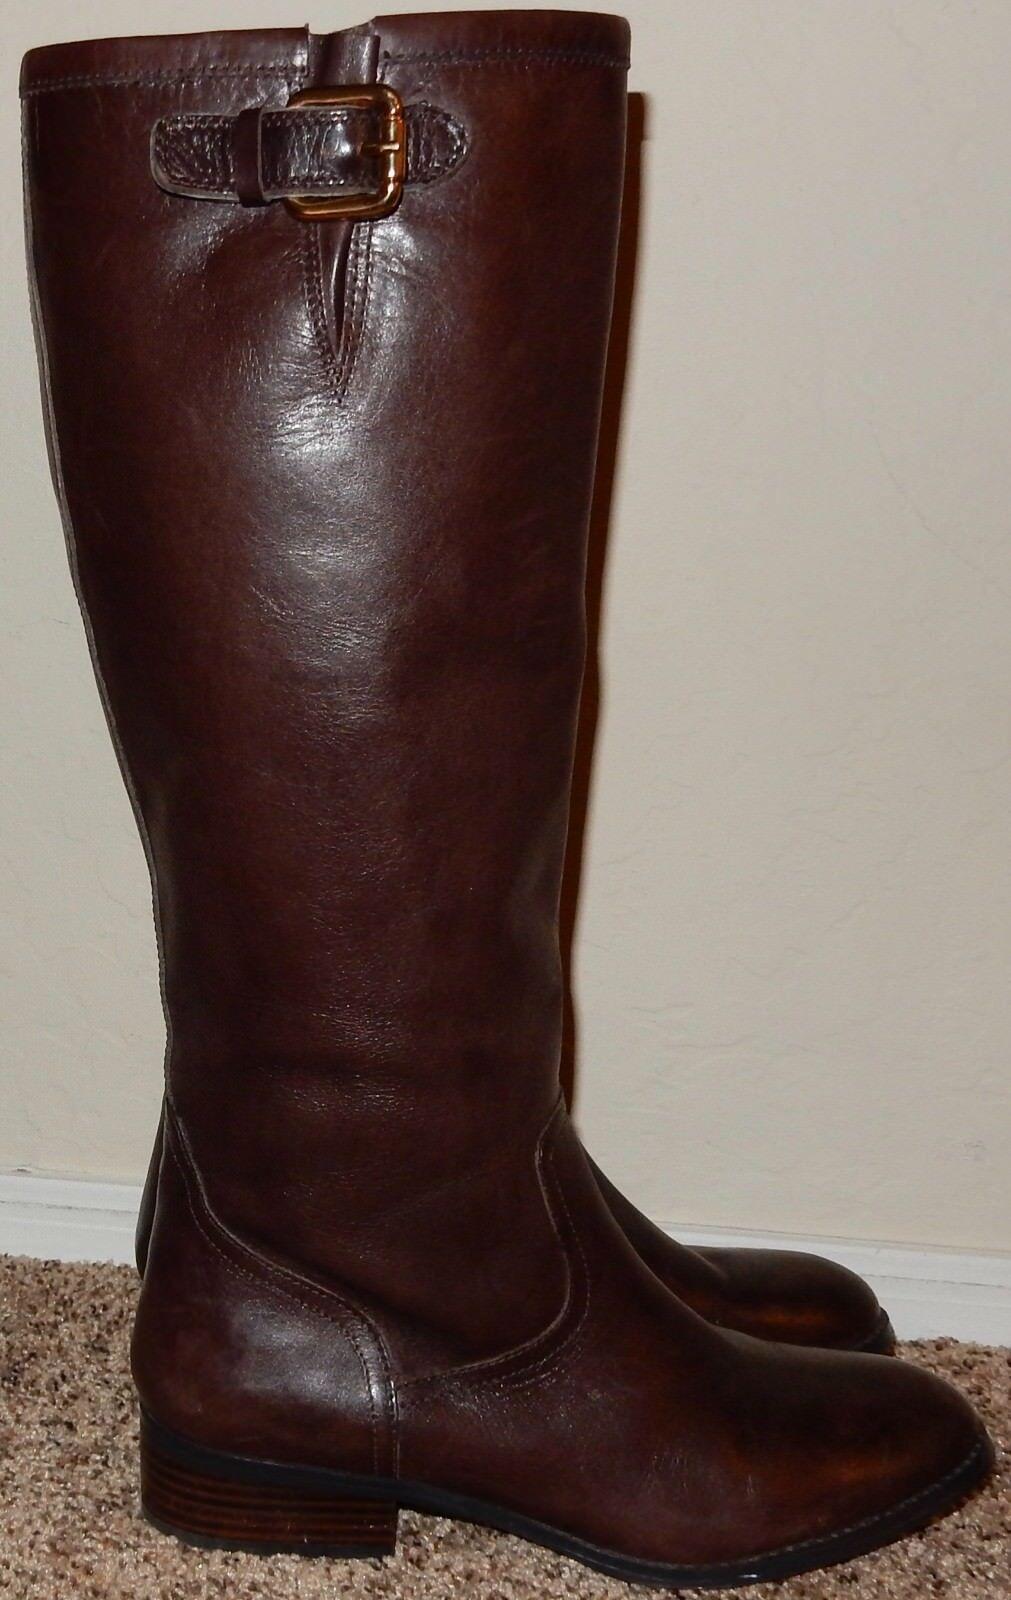 Ralph Lauren Brown Leather Boots Sz 9.5